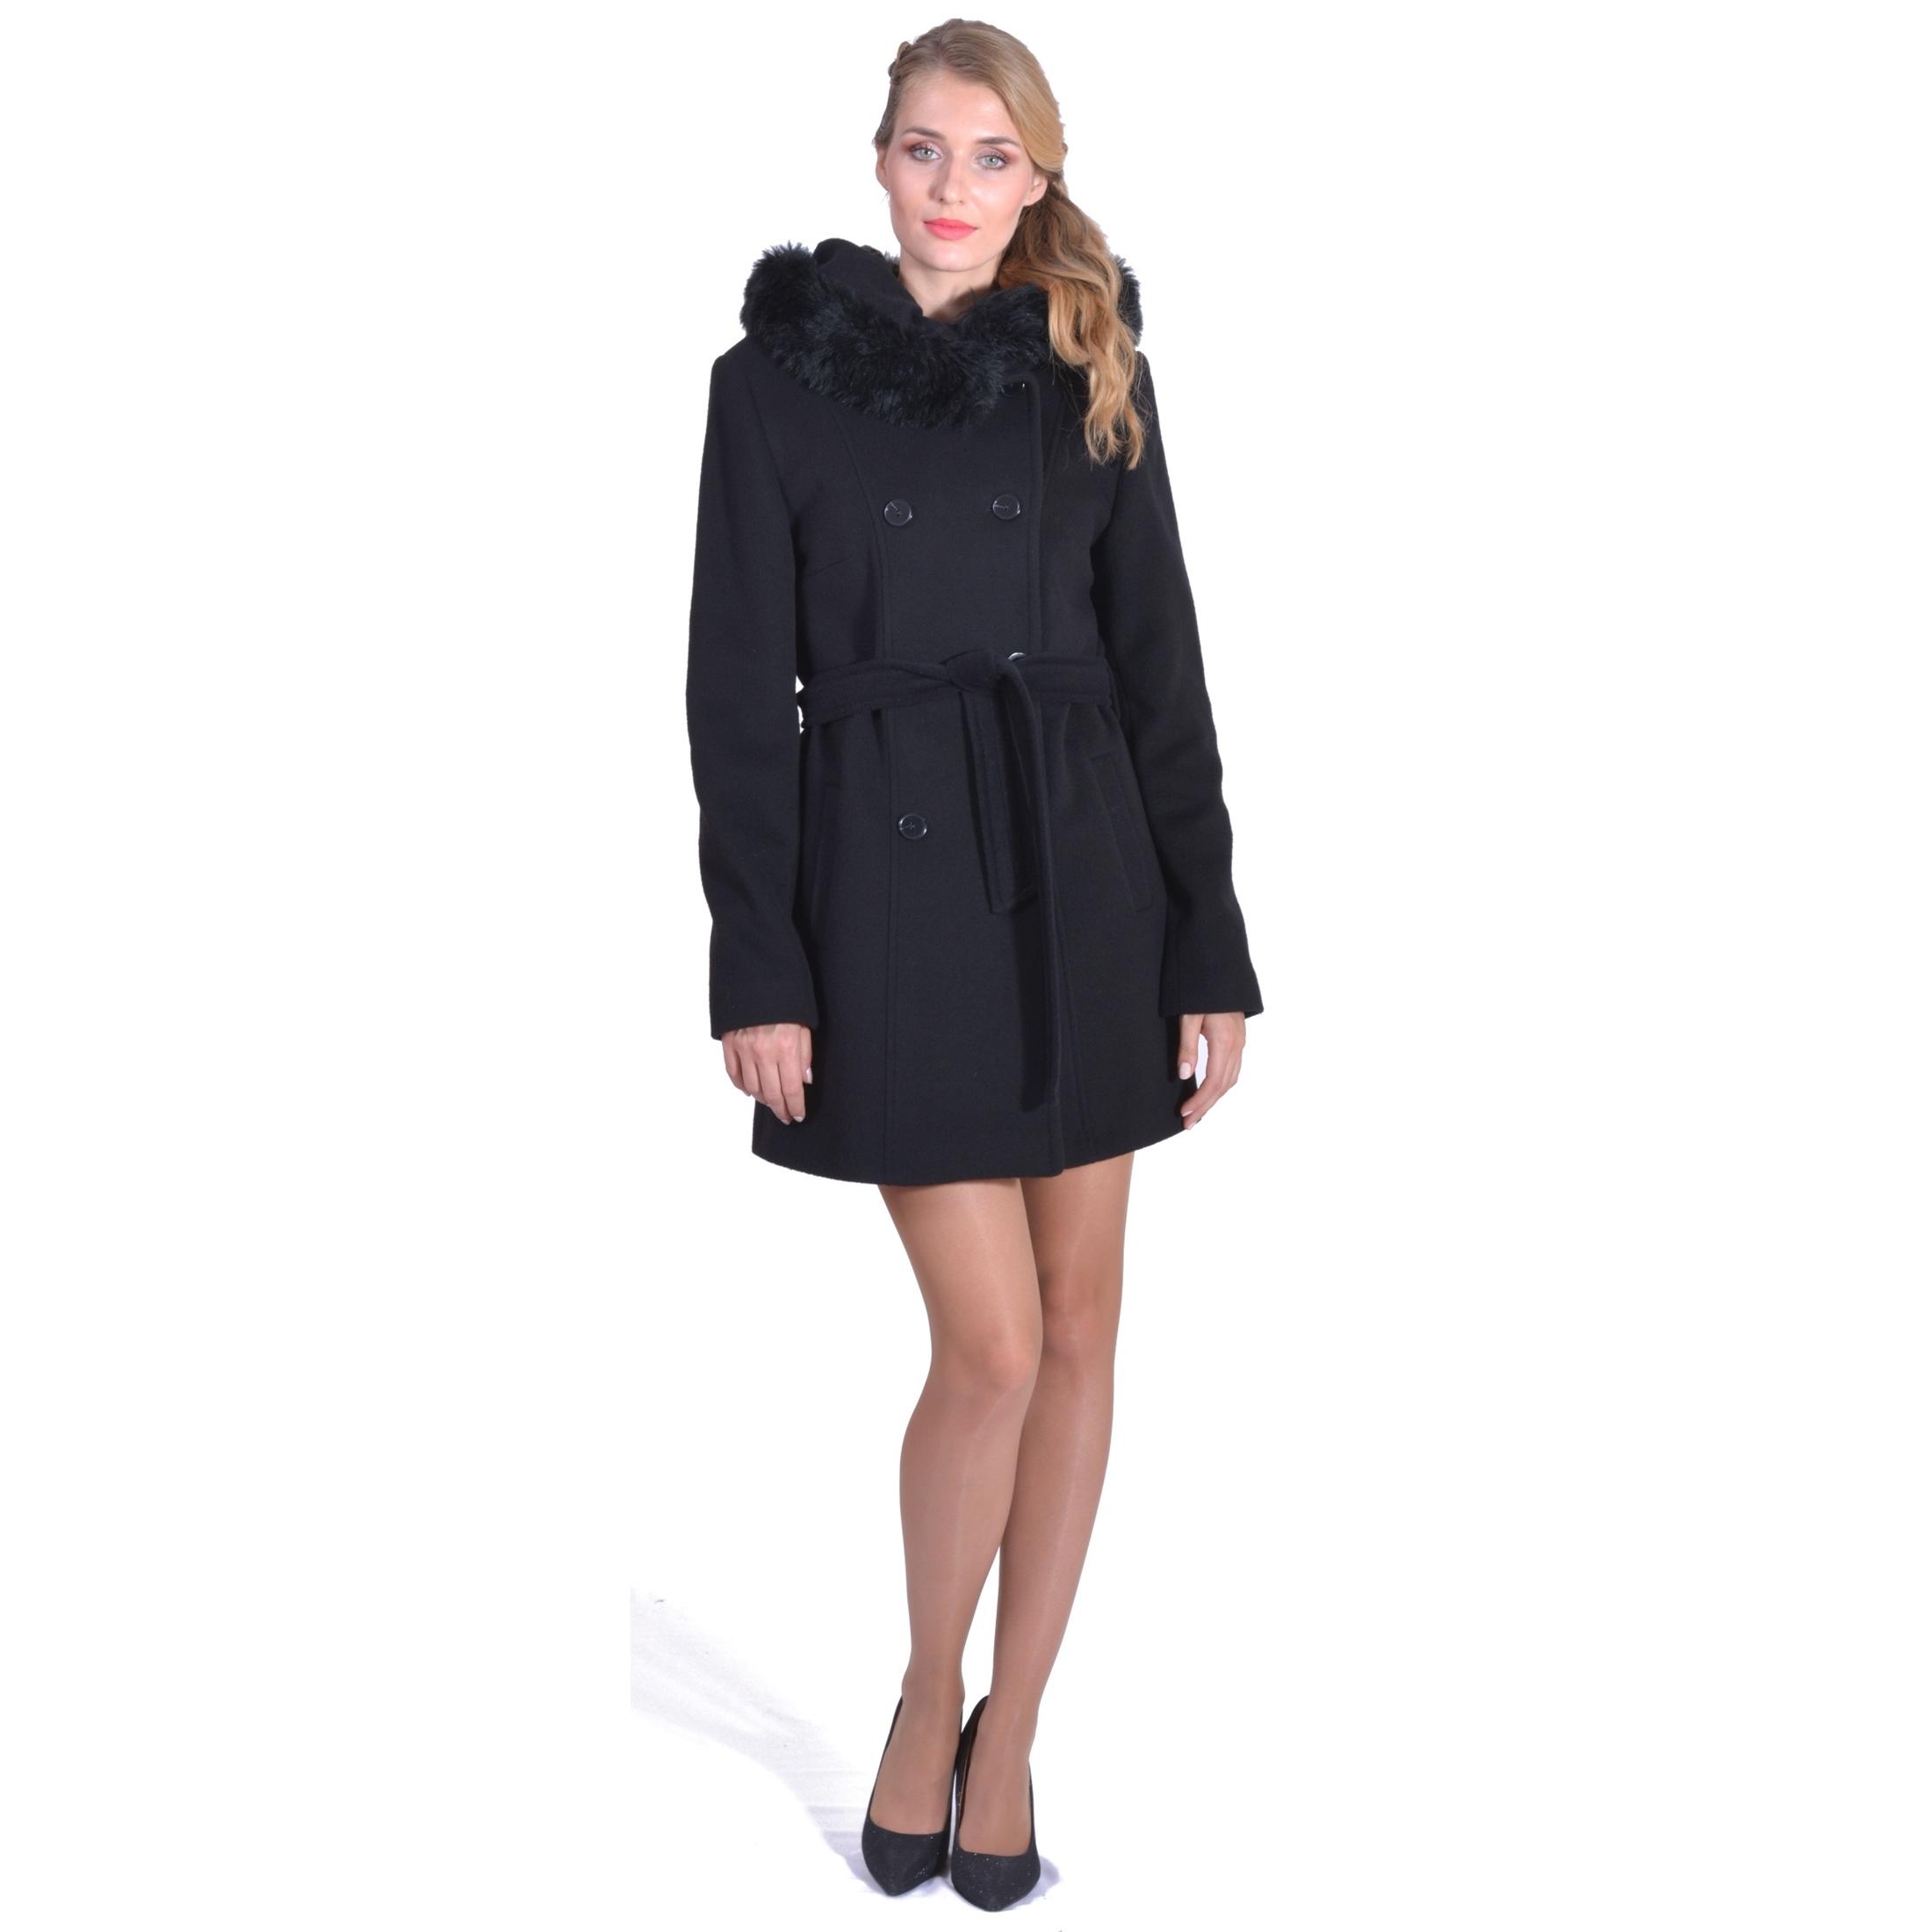 lady m coat, winter coat, zimski kaput za žene,kratki kaput,crni kaput, black coat